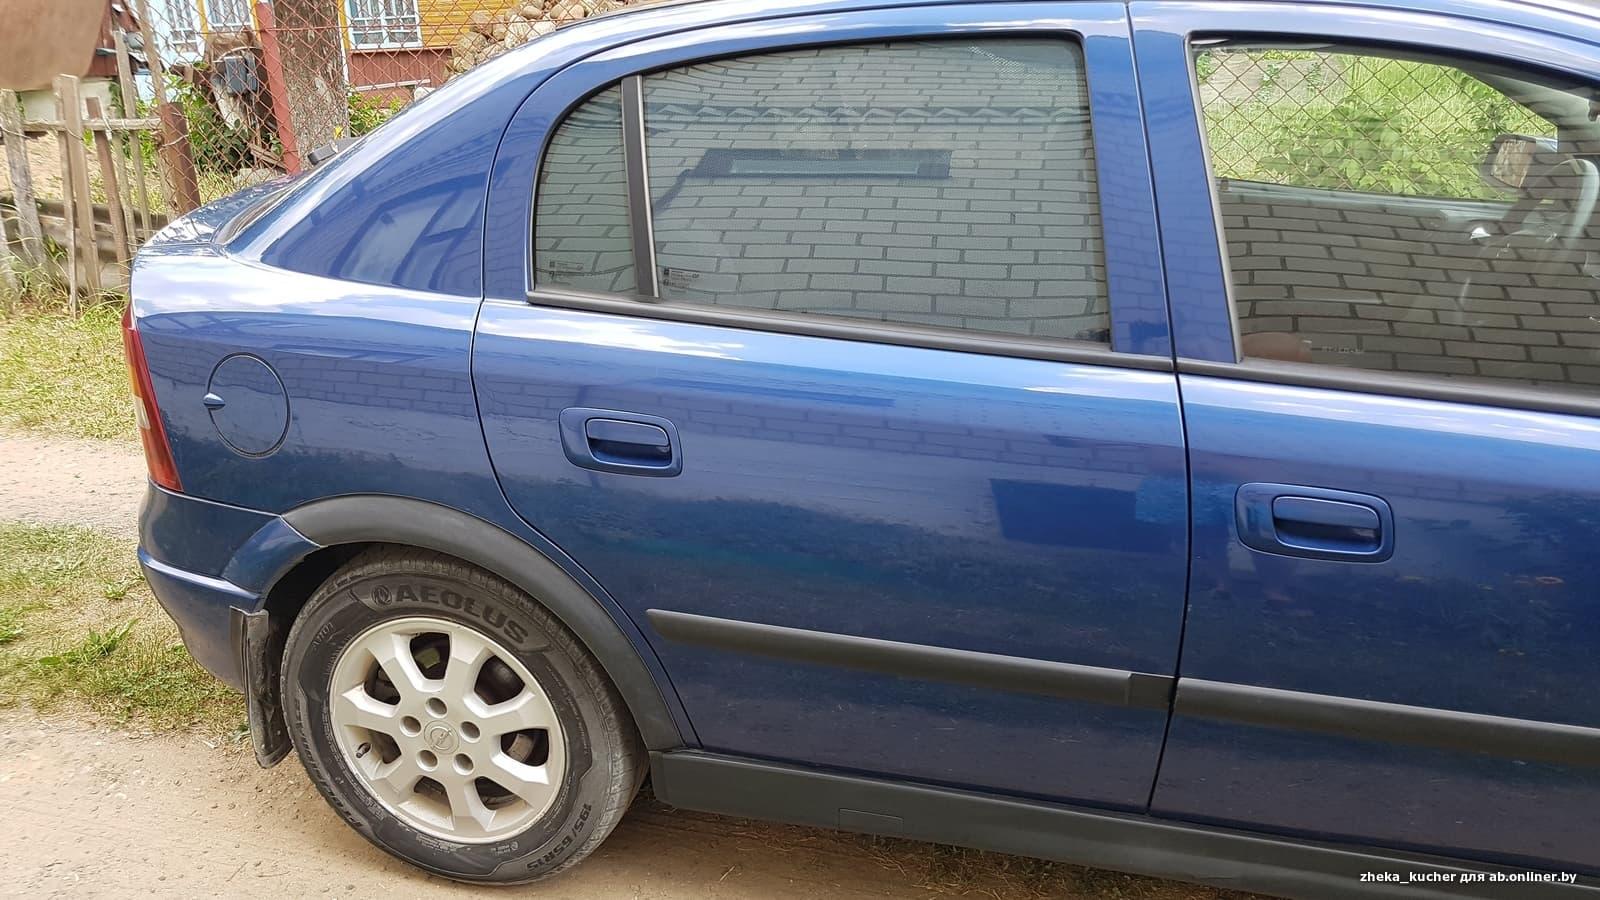 Opel Astra dti